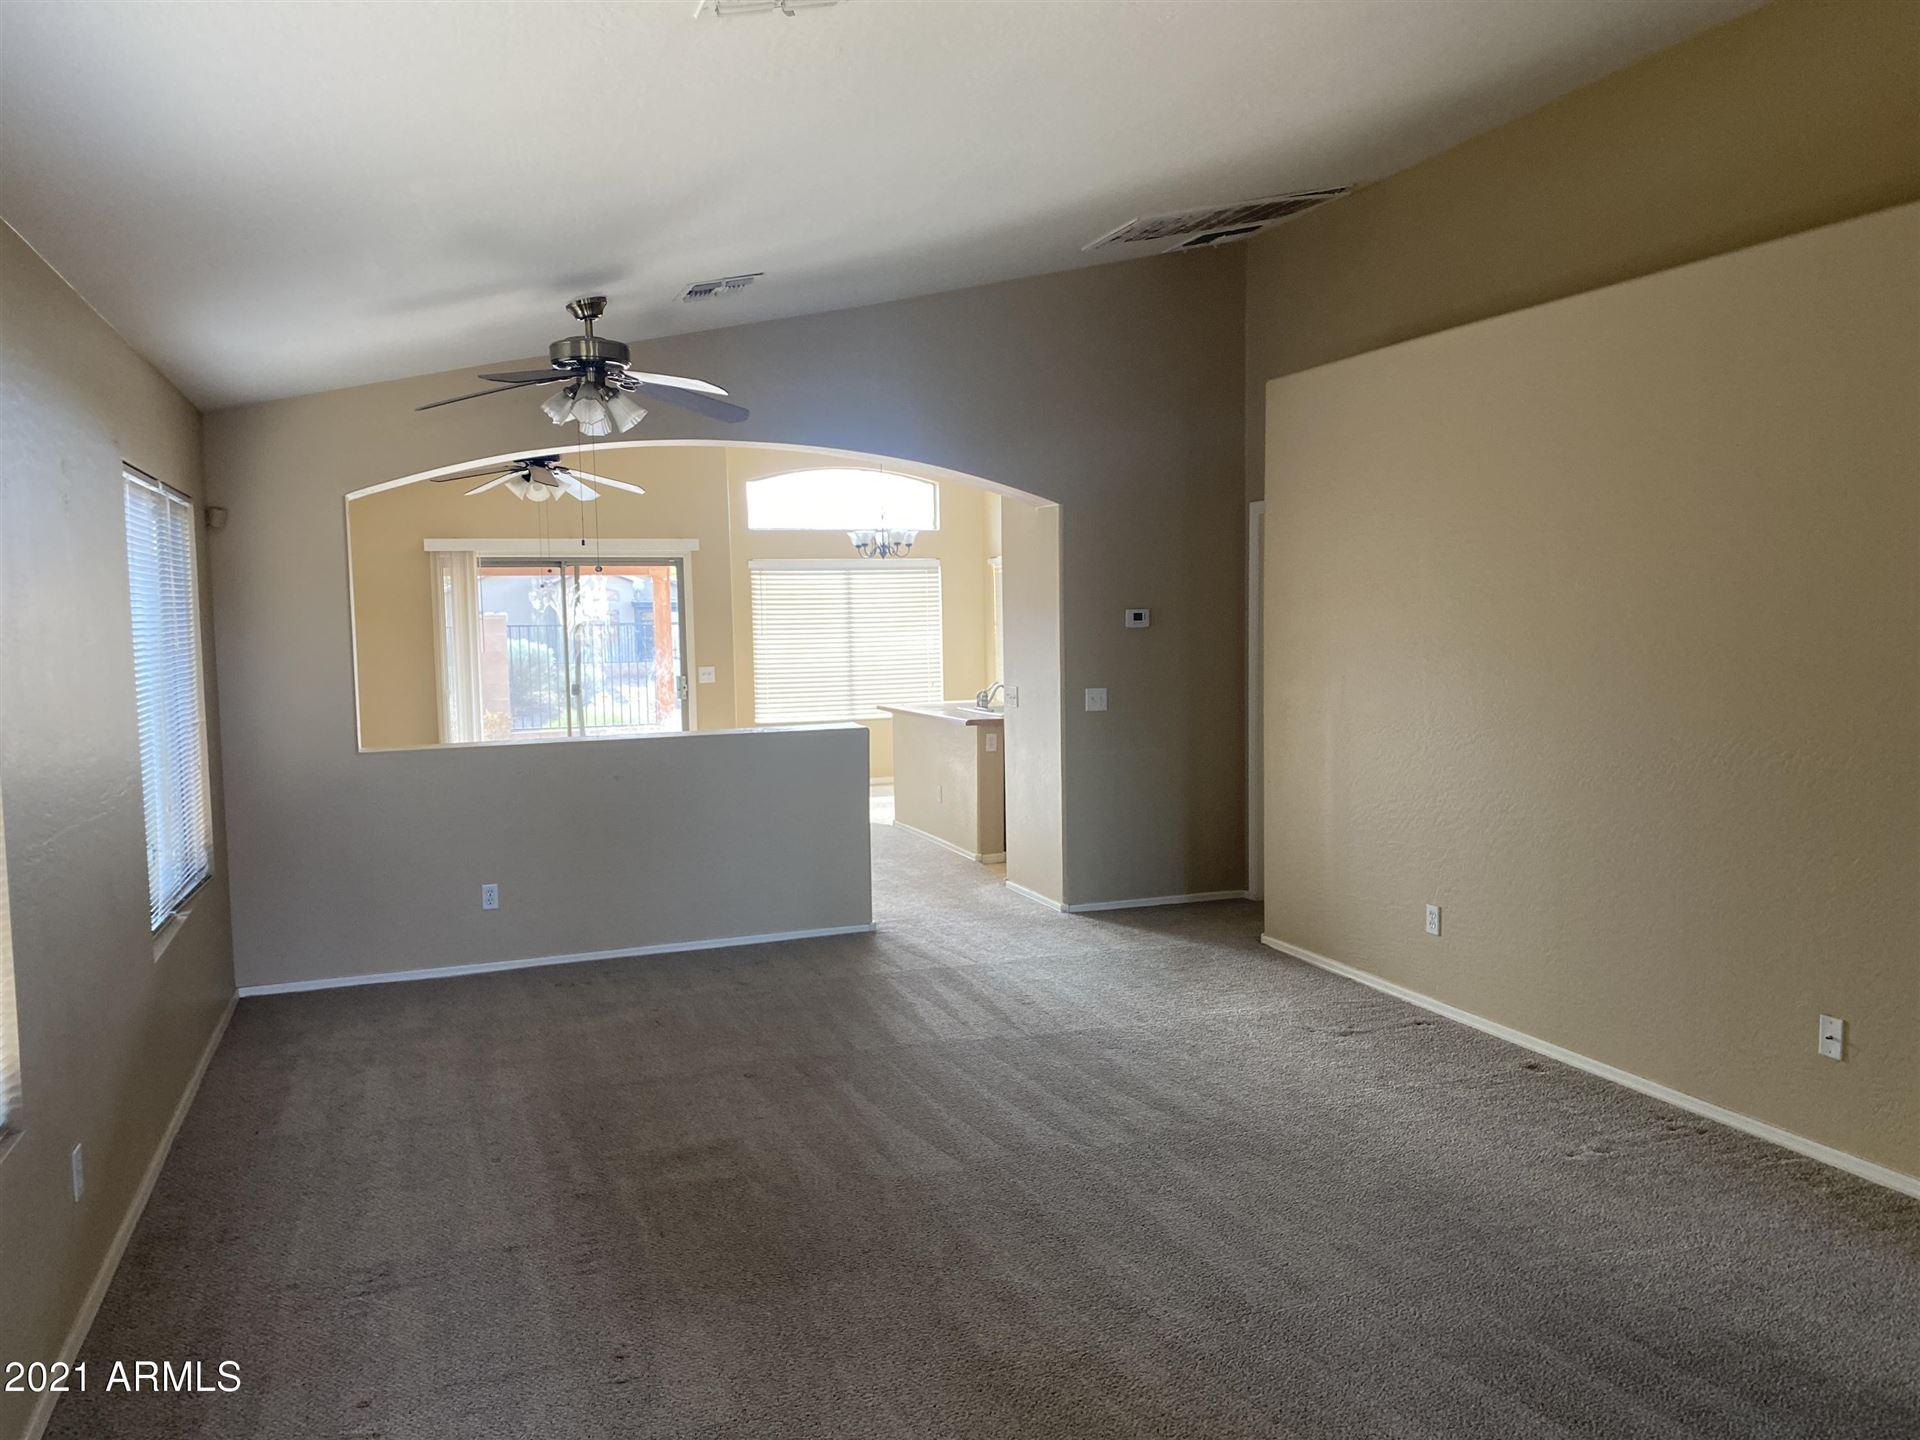 Photo of 15857 W MADISON Street, Goodyear, AZ 85338 (MLS # 6306865)